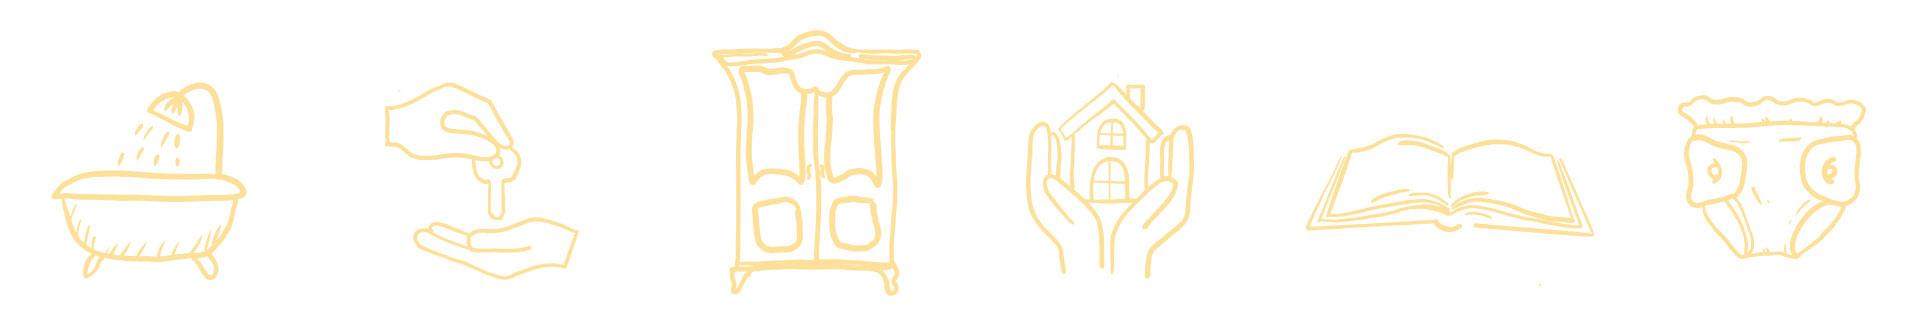 Project Illustrations